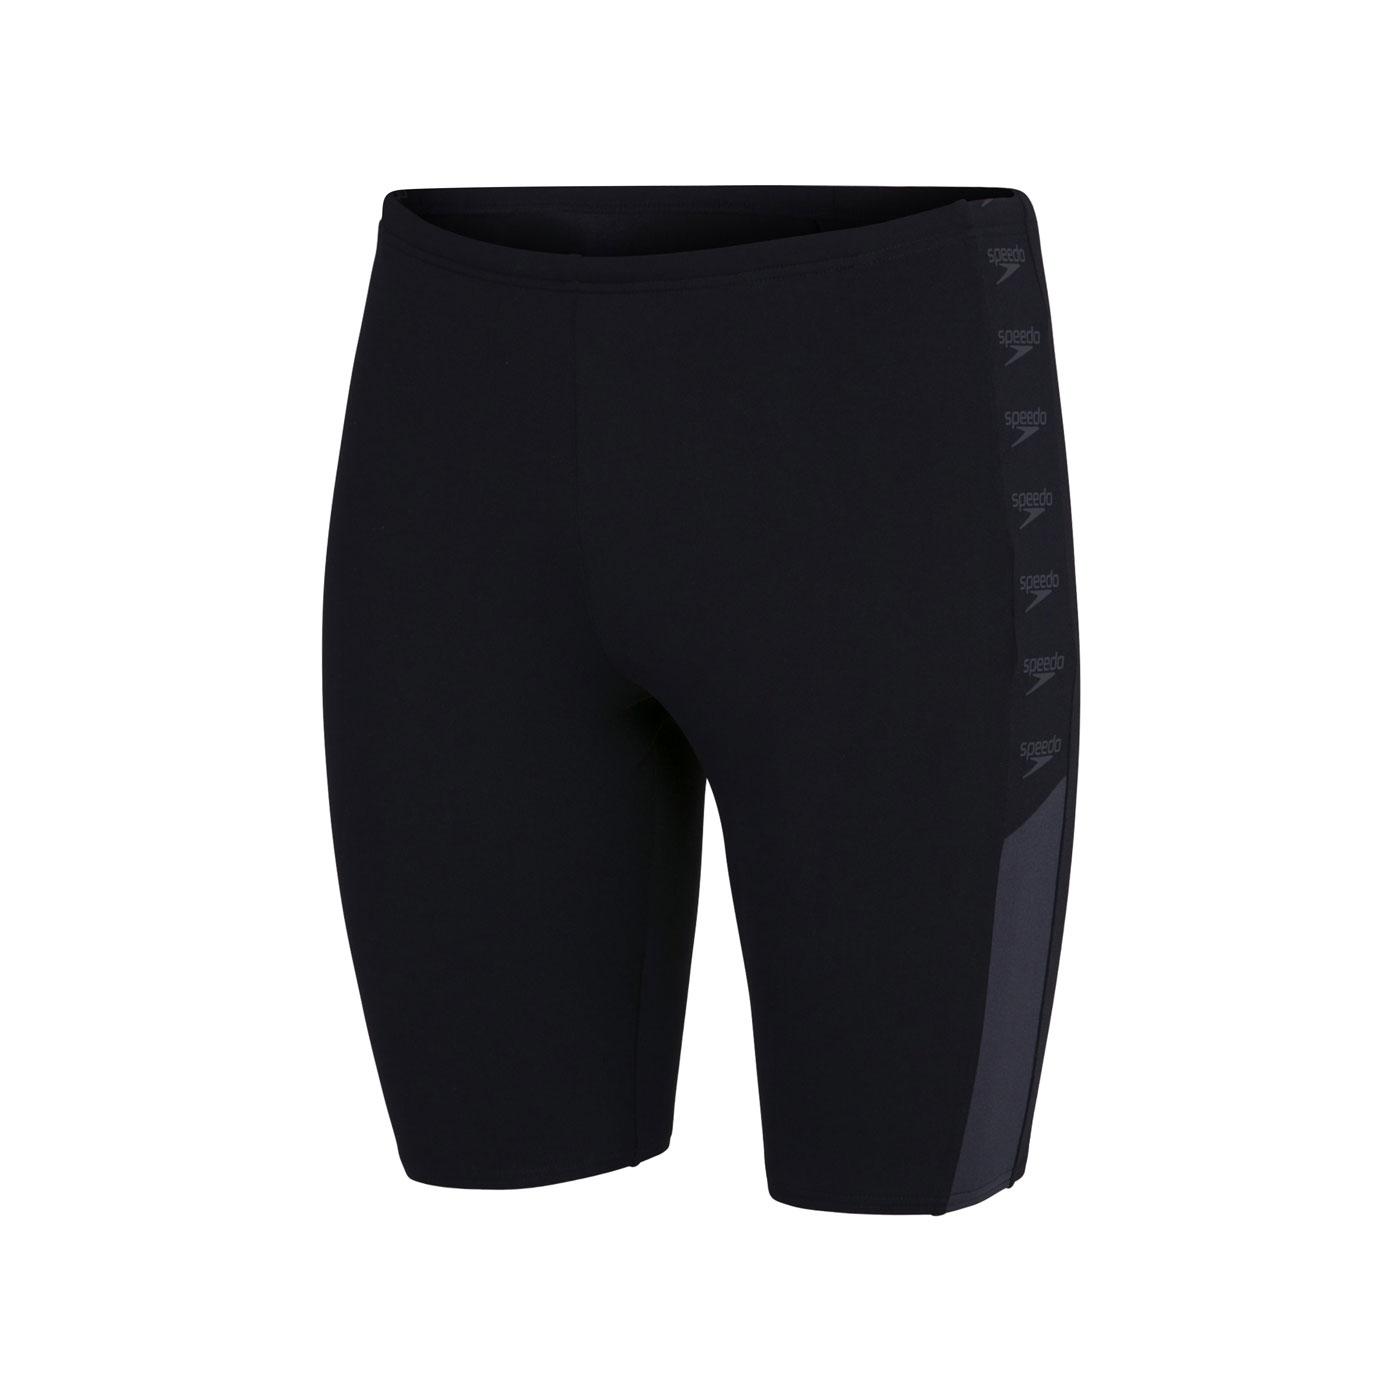 SPEEDO 男款運動及膝泳褲 SD8128229023